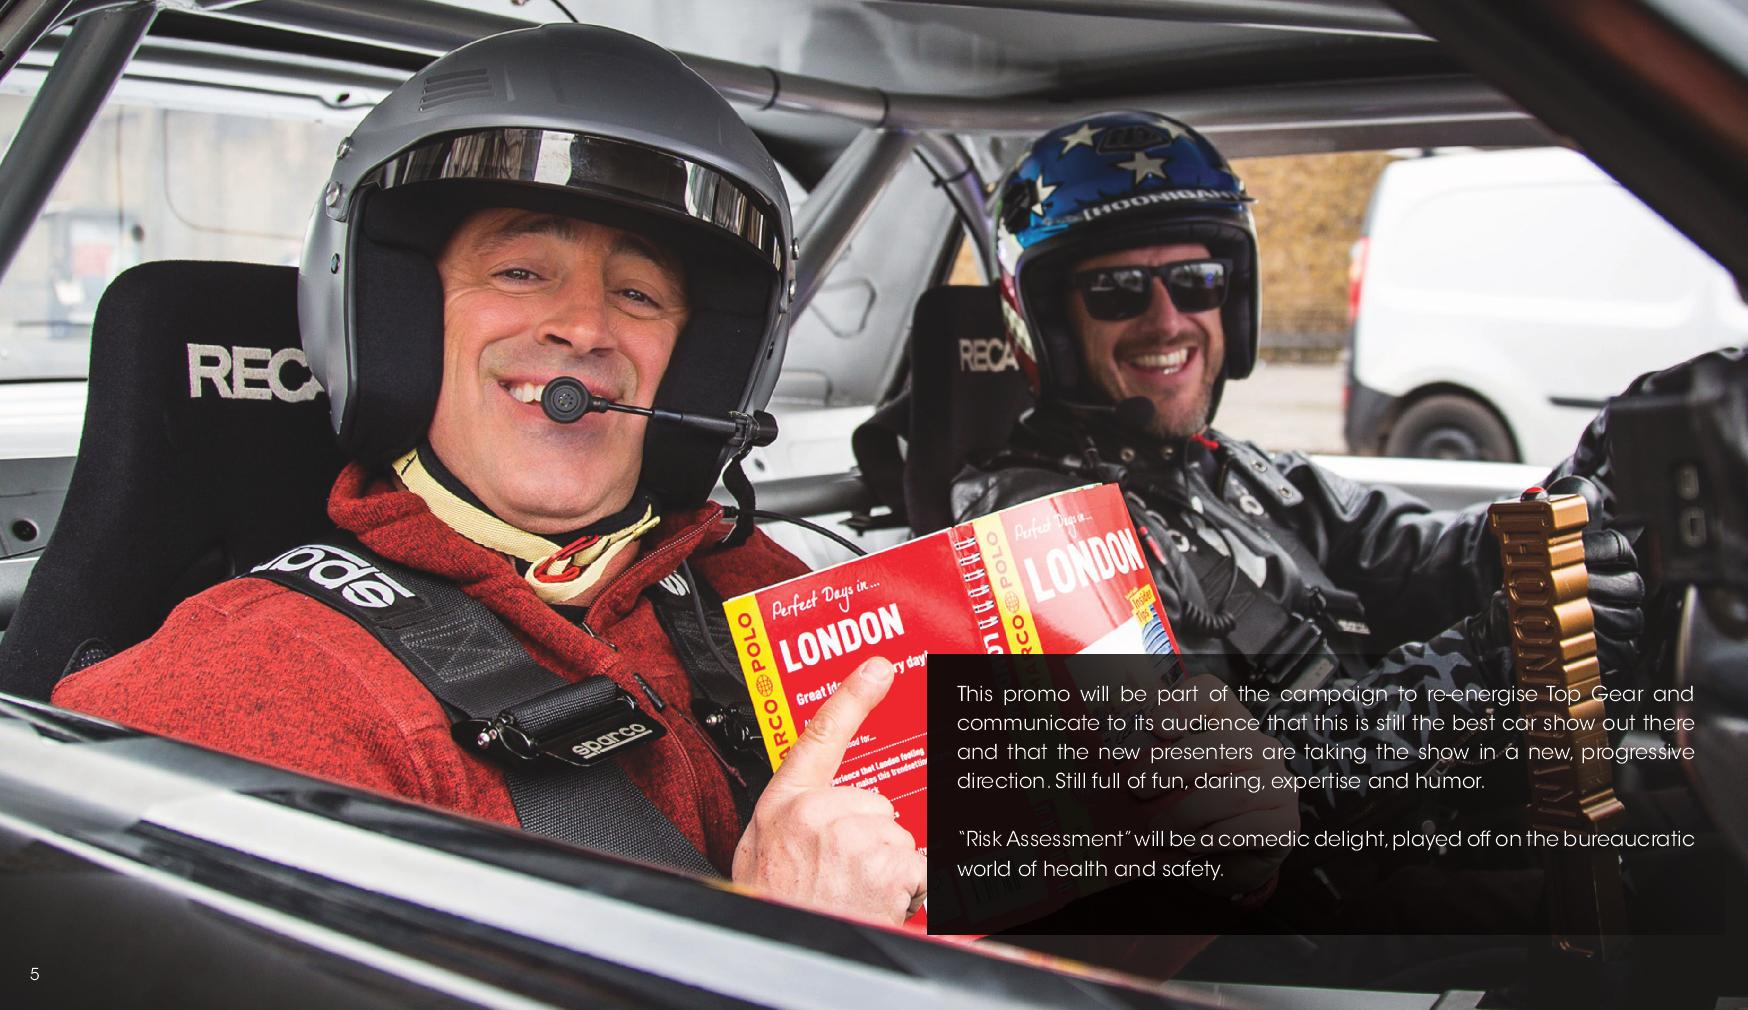 Top Gear-page-005.jpg